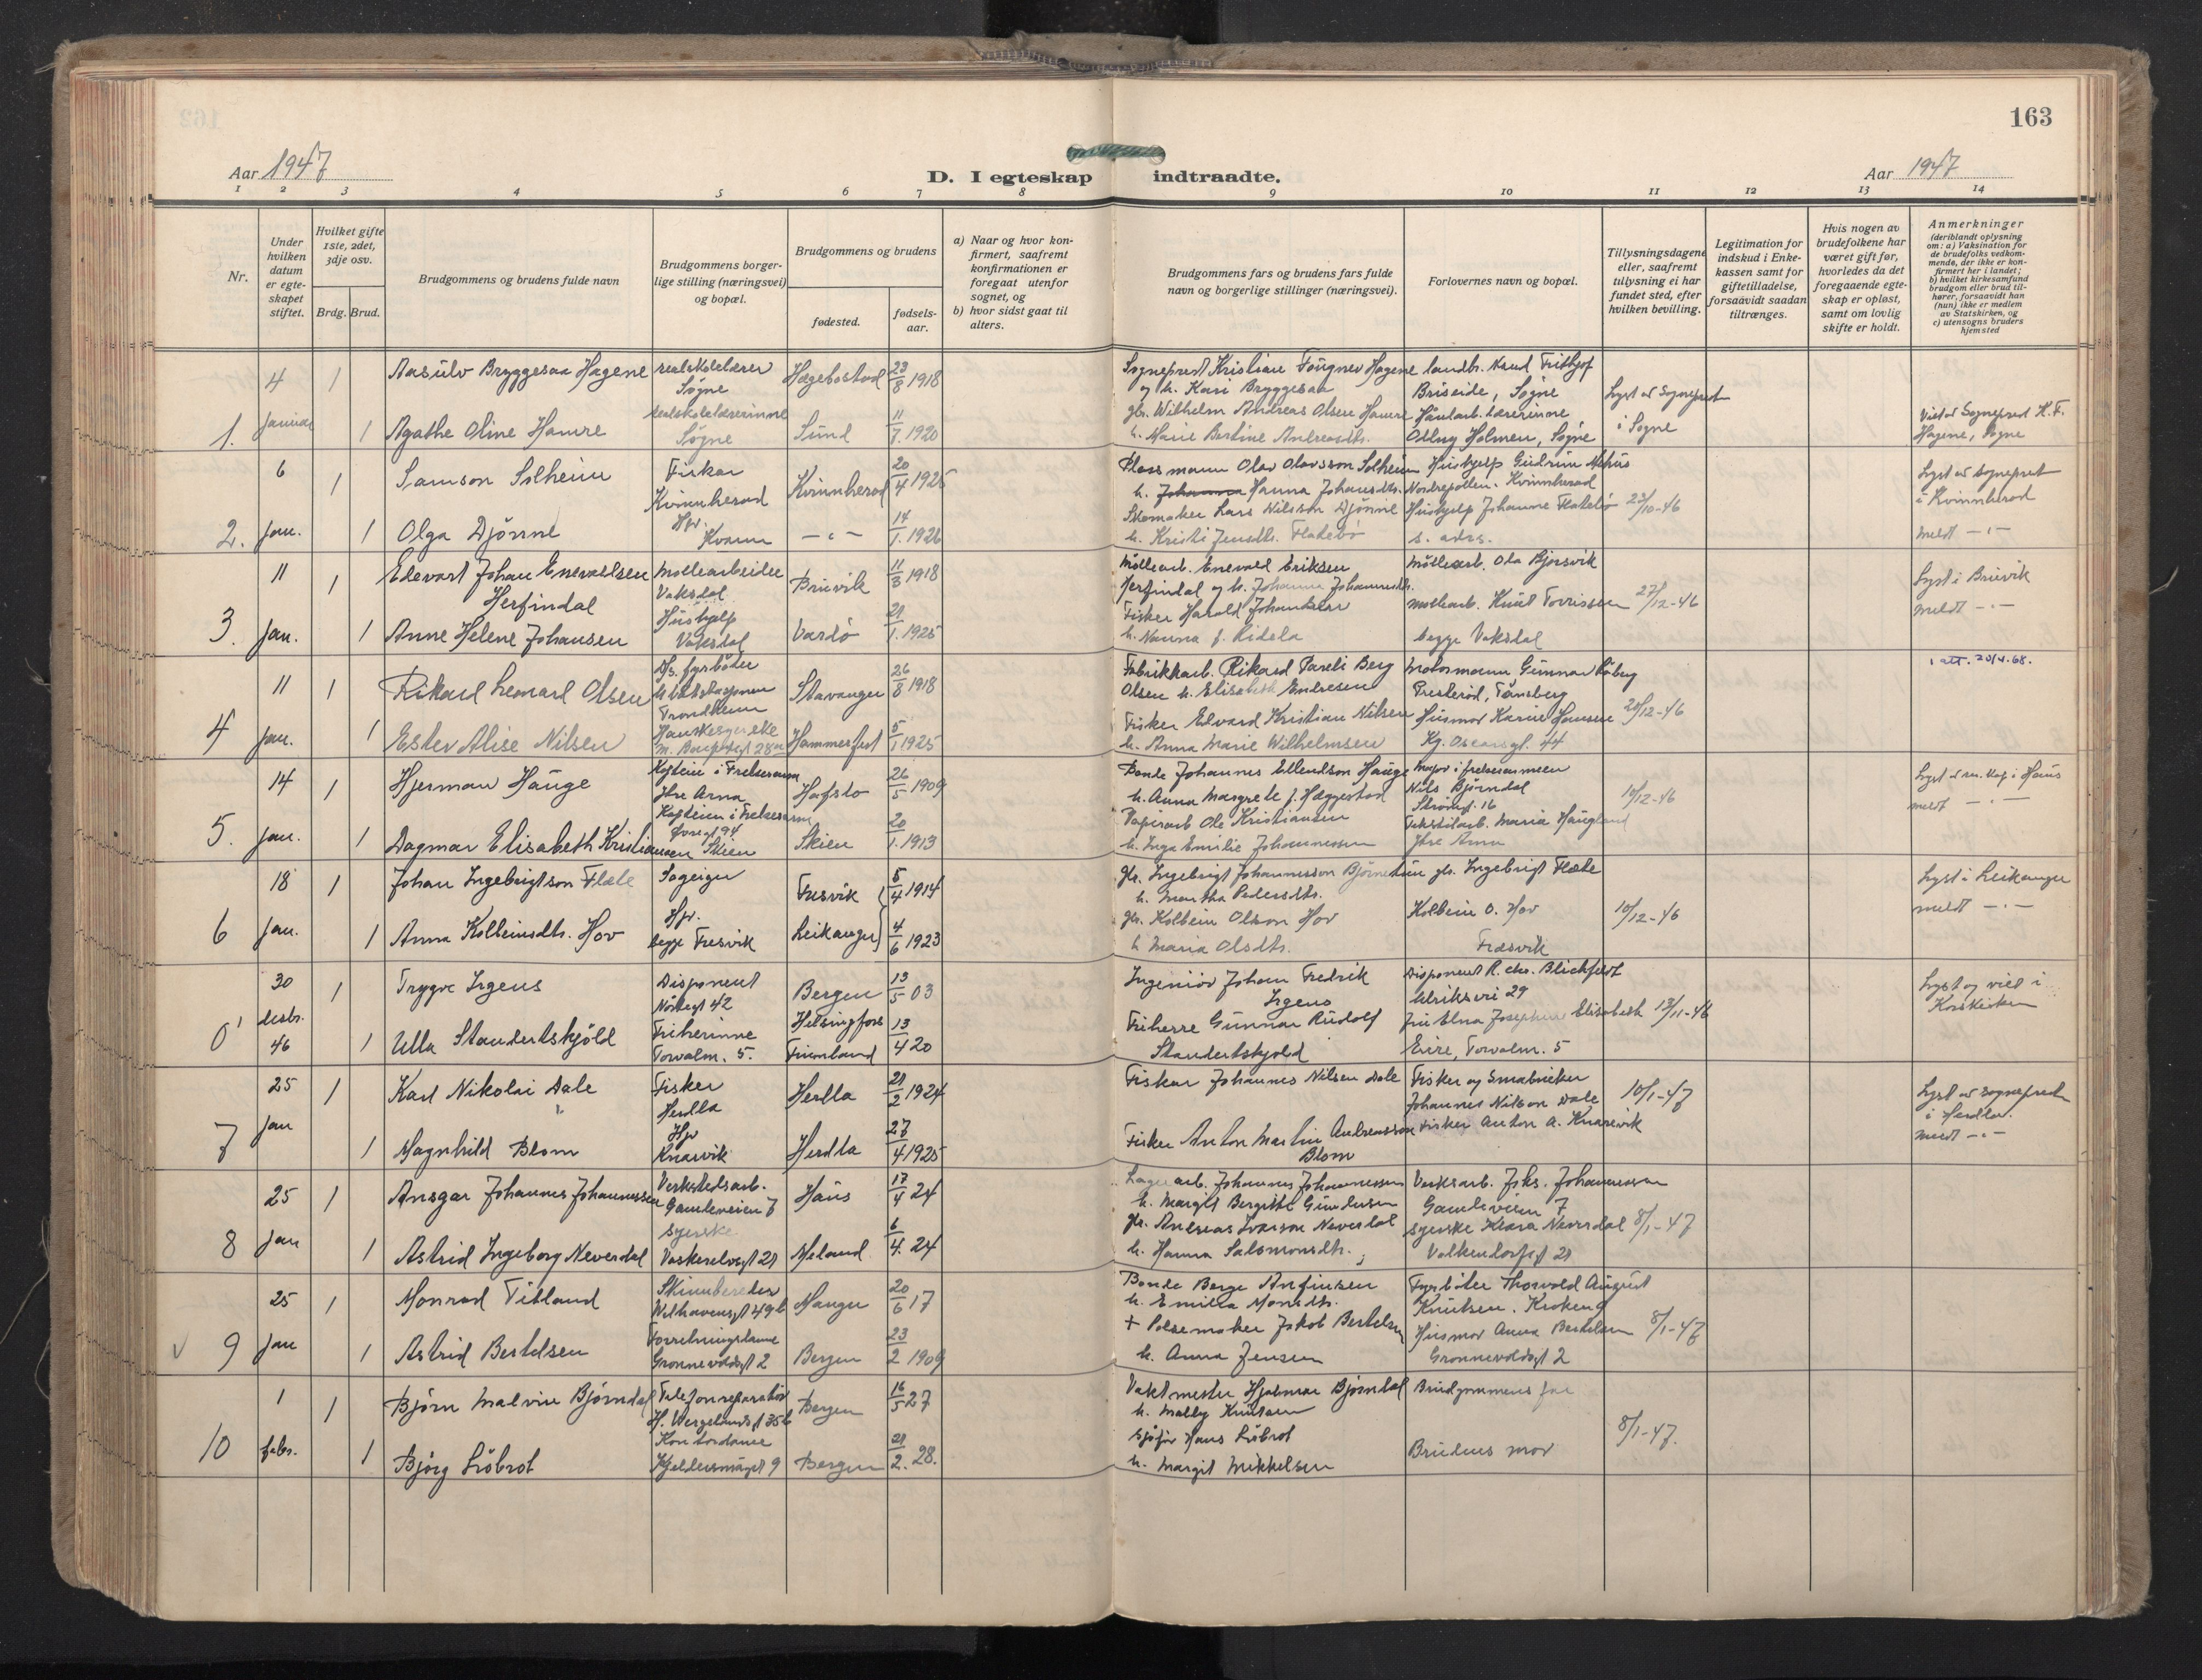 SAB, Domkirken Sokneprestembete, H/Haa: Ministerialbok nr. D 7, 1937-1950, s. 162b-163a